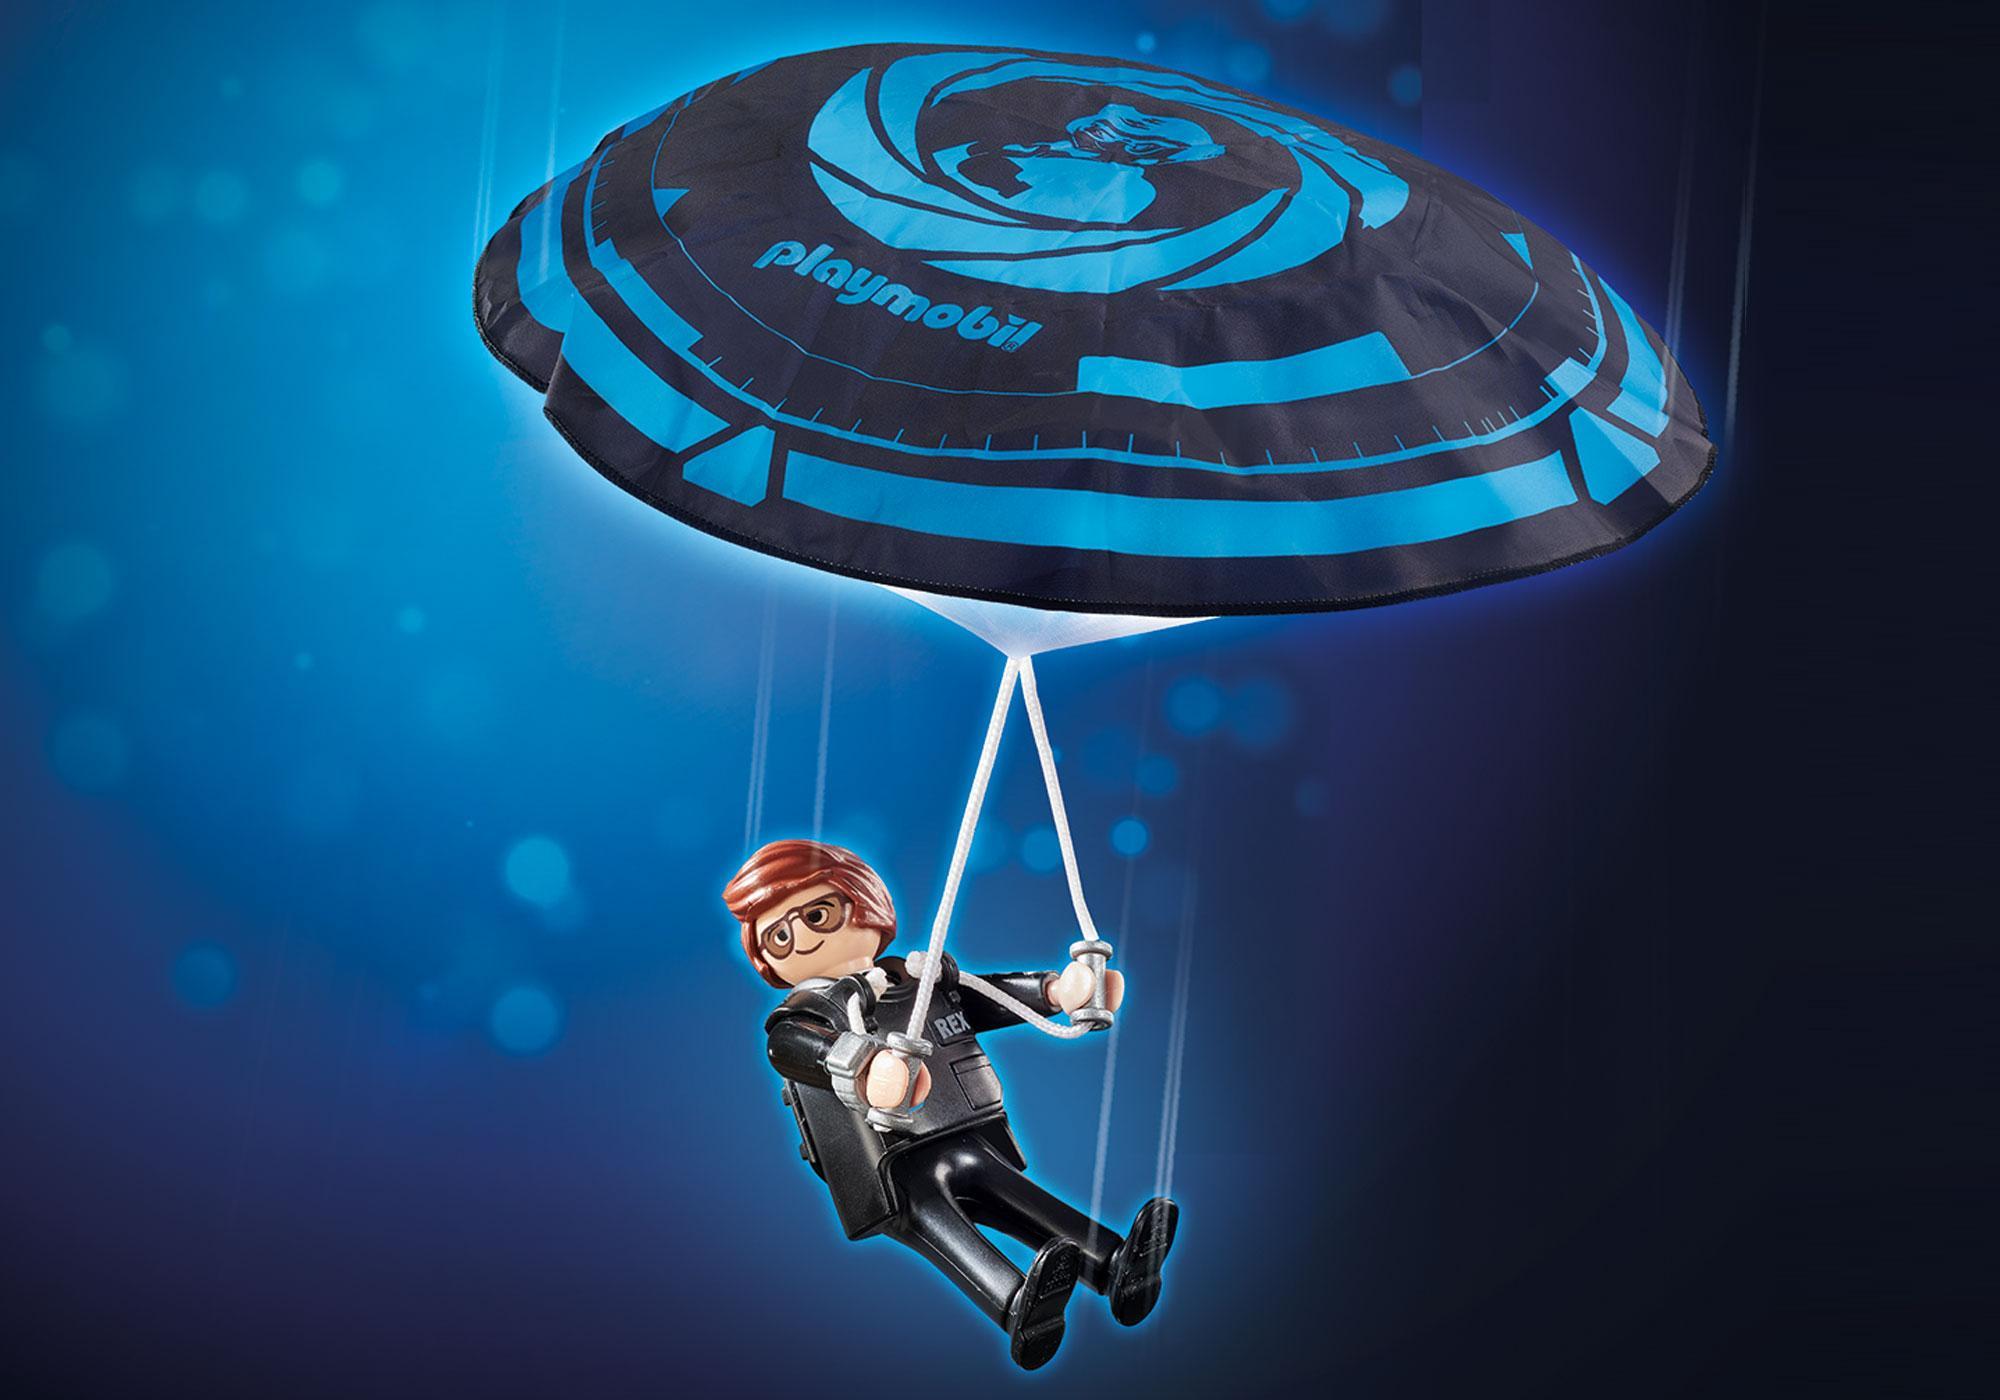 70070_product_detail/PLAYMOBIL: THE MOVIE Rex Dasher con Paracaídas